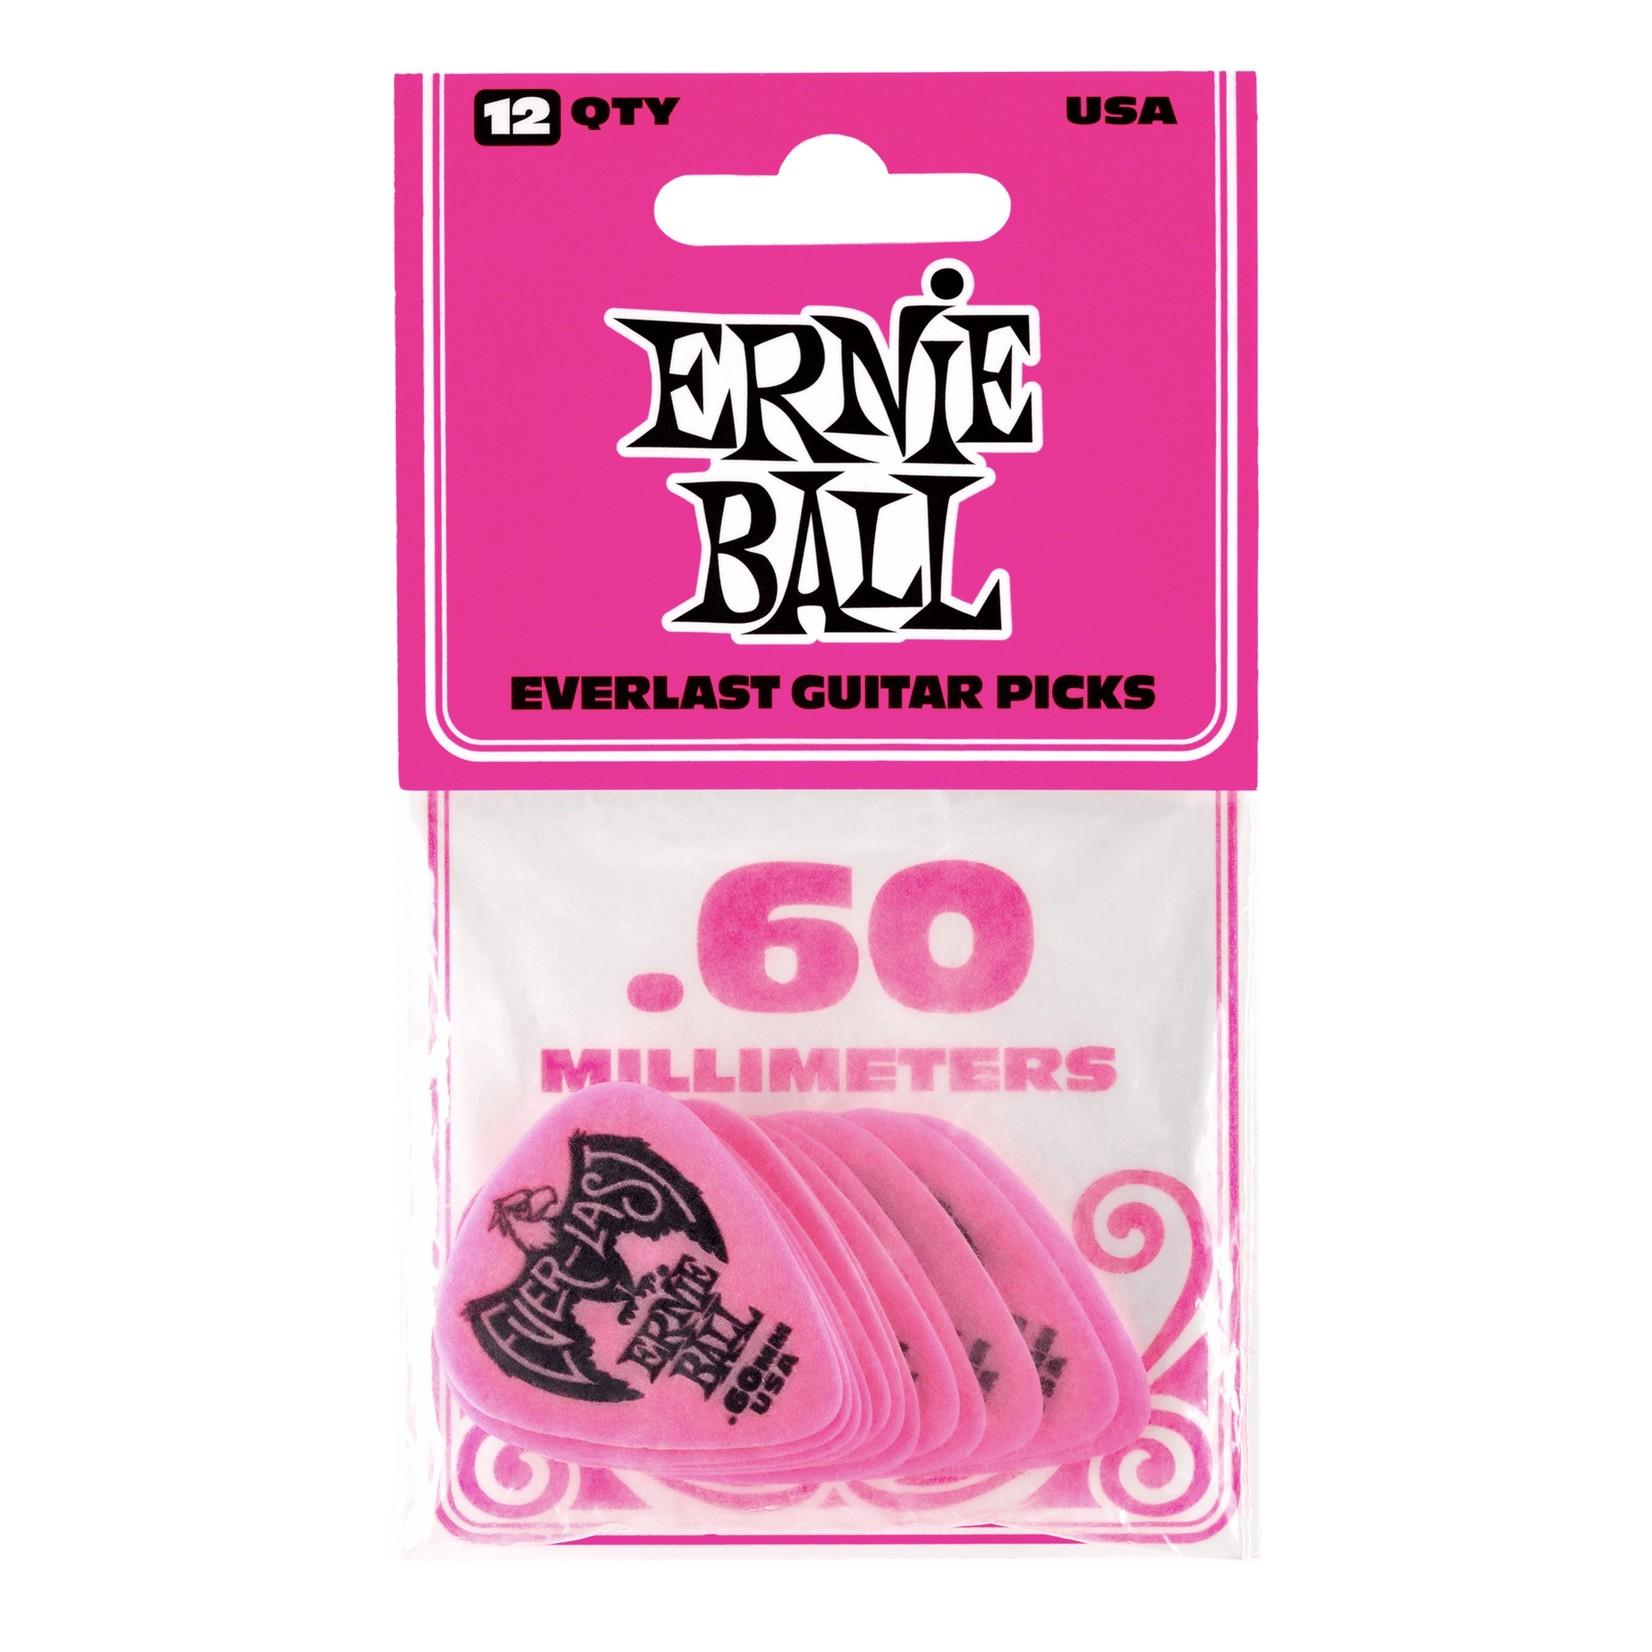 Ernie Ball Ernie Ball .60mm Everlast Picks, 12-Pack, Pink